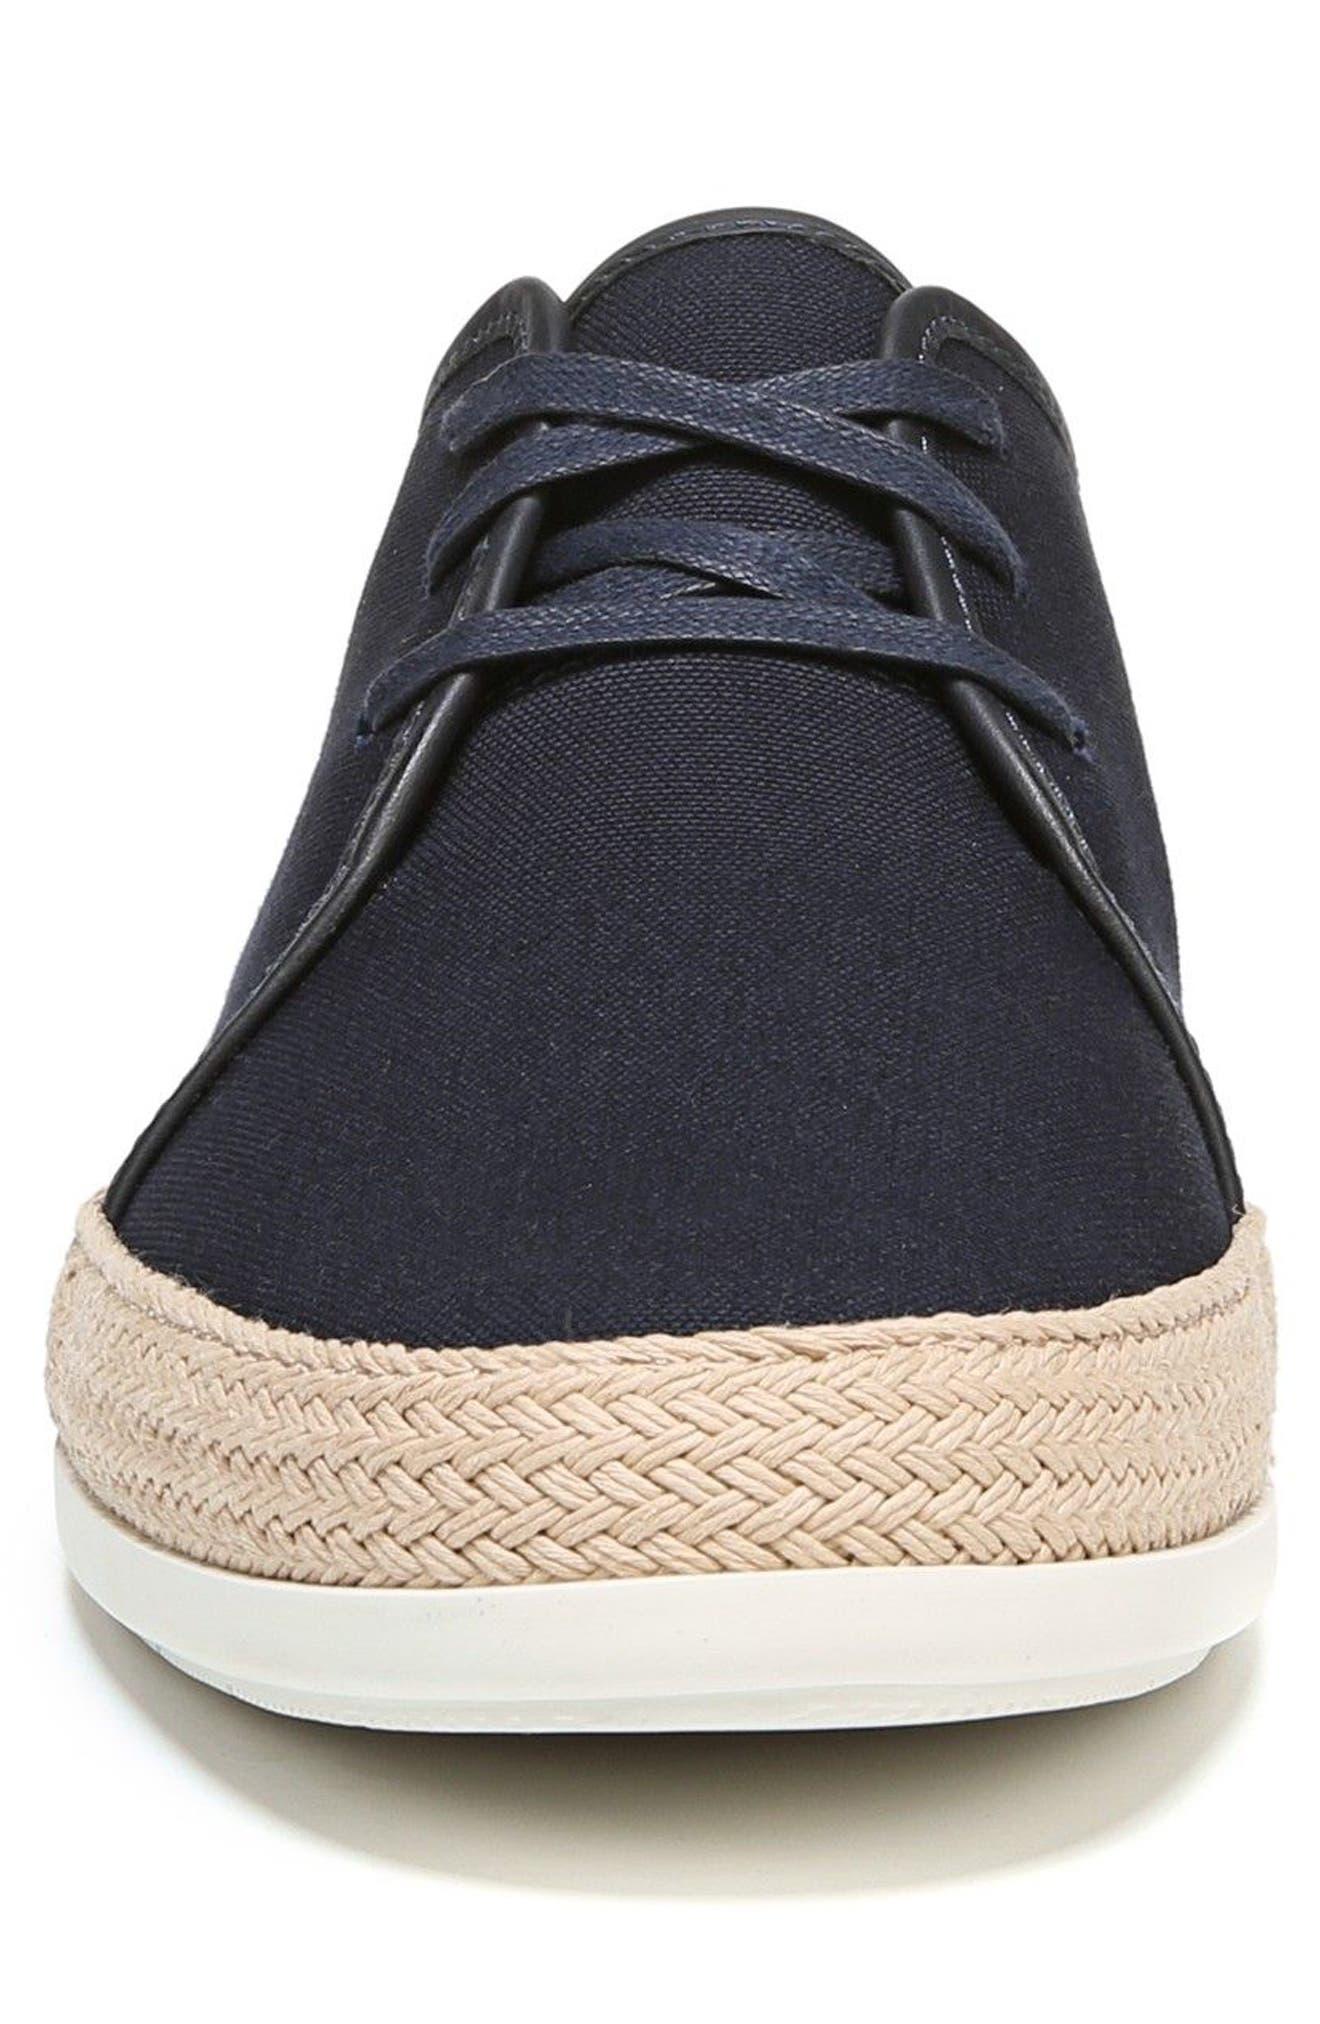 Chandler Espadrille Sneaker,                             Alternate thumbnail 4, color,                             Coastal